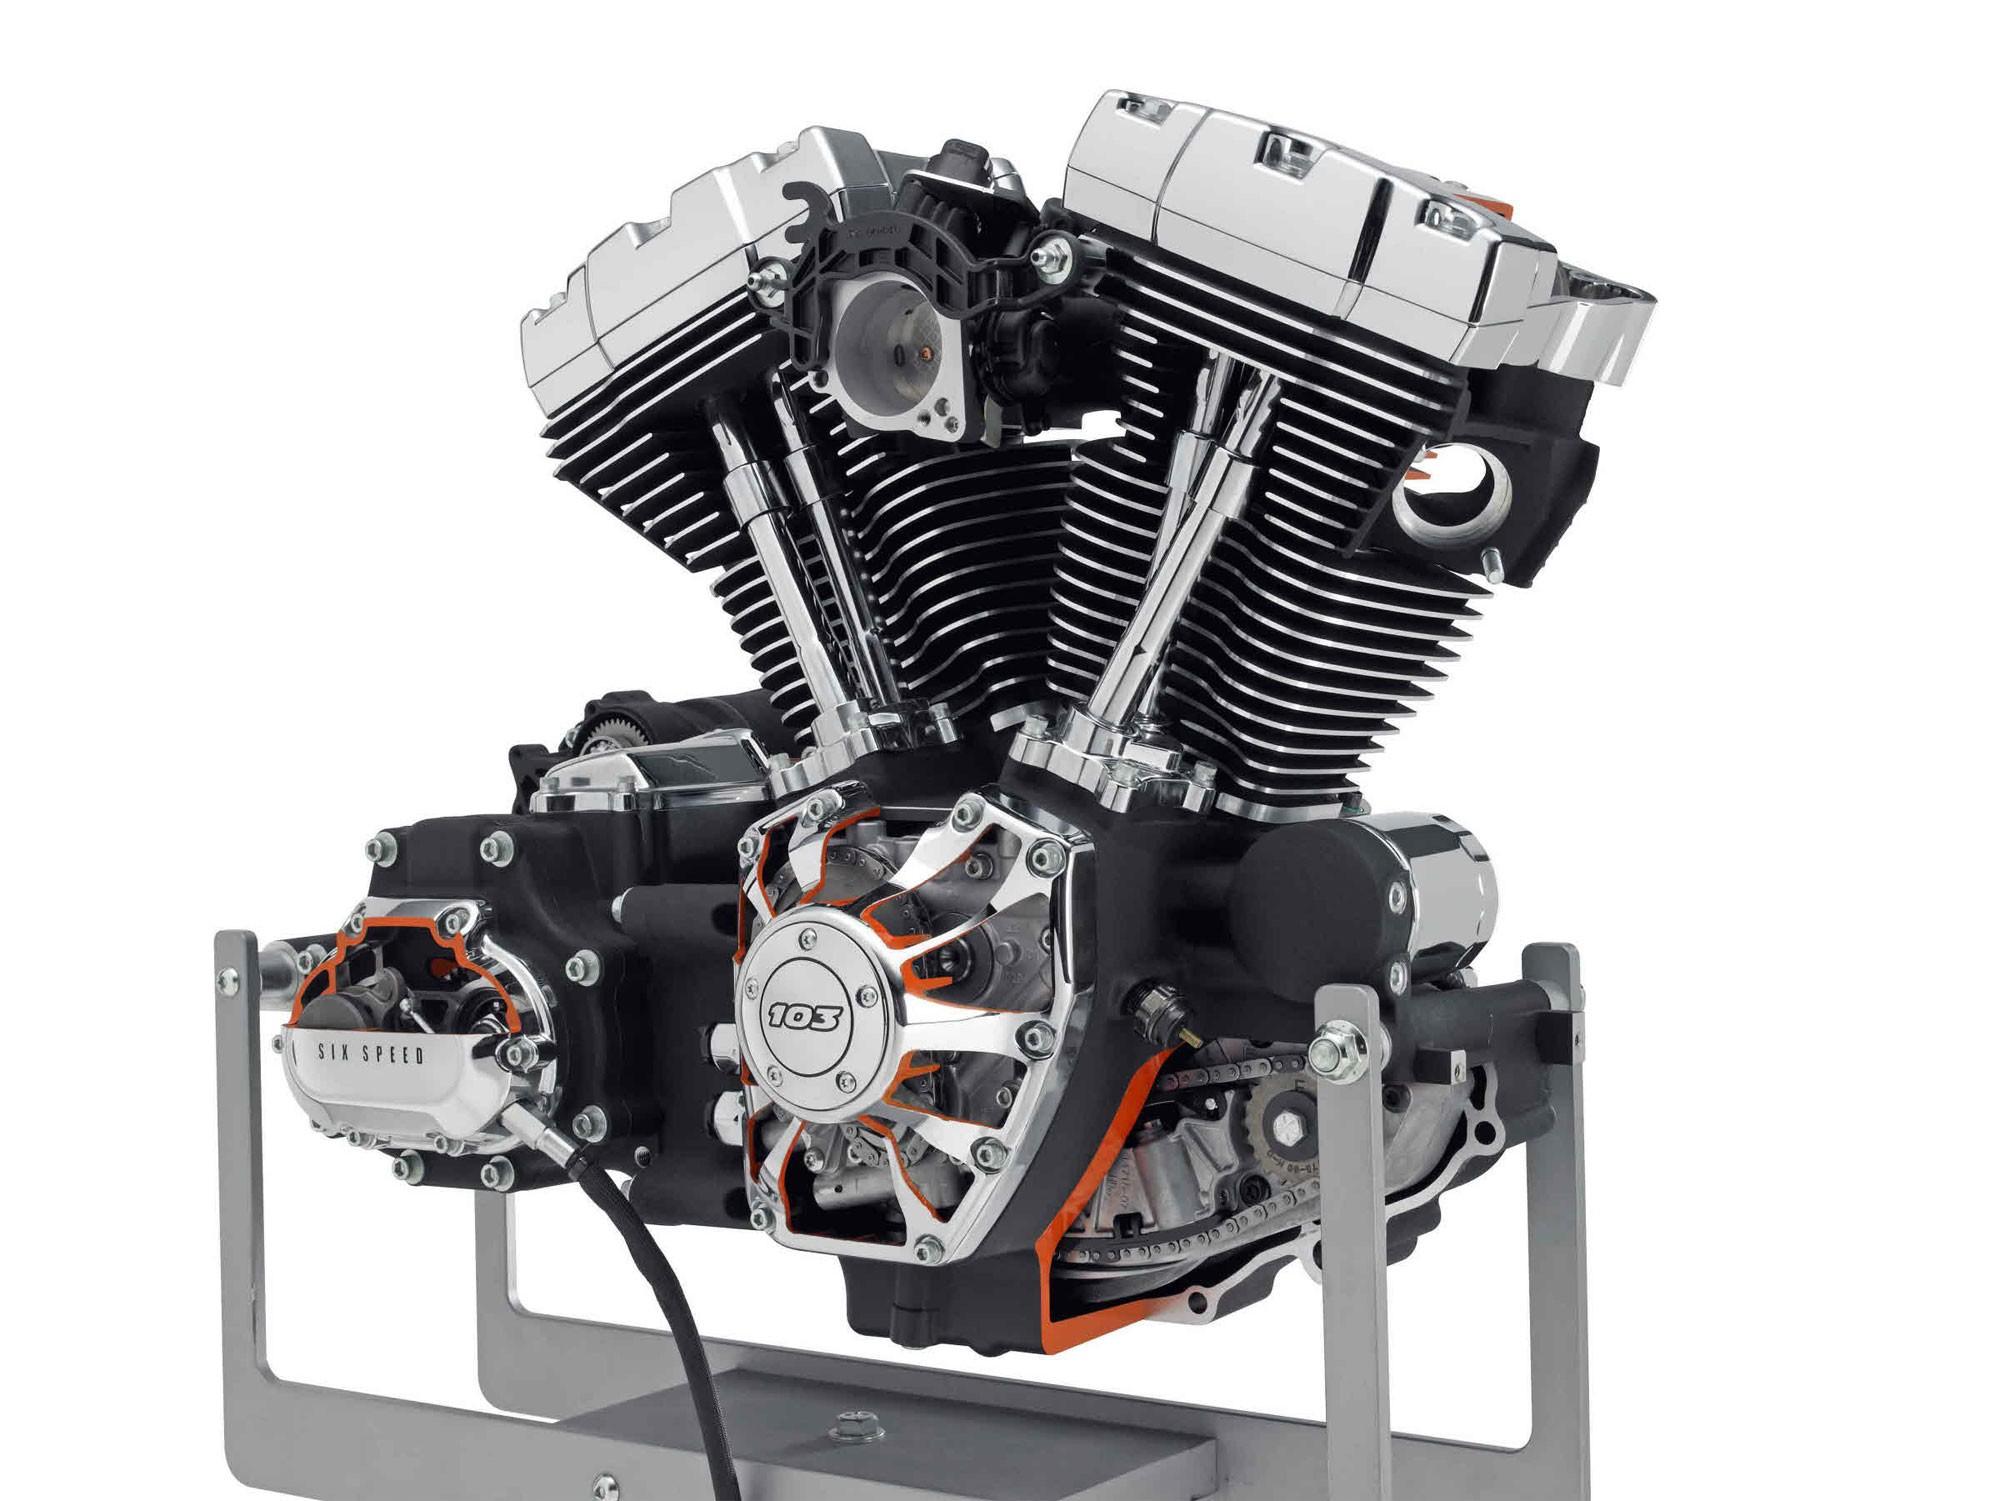 Harley Twin Cam Engine Diagram Harley Davidson Engine Parts Catalog Lovely 2012 Harley Davidson Of Harley Twin Cam Engine Diagram